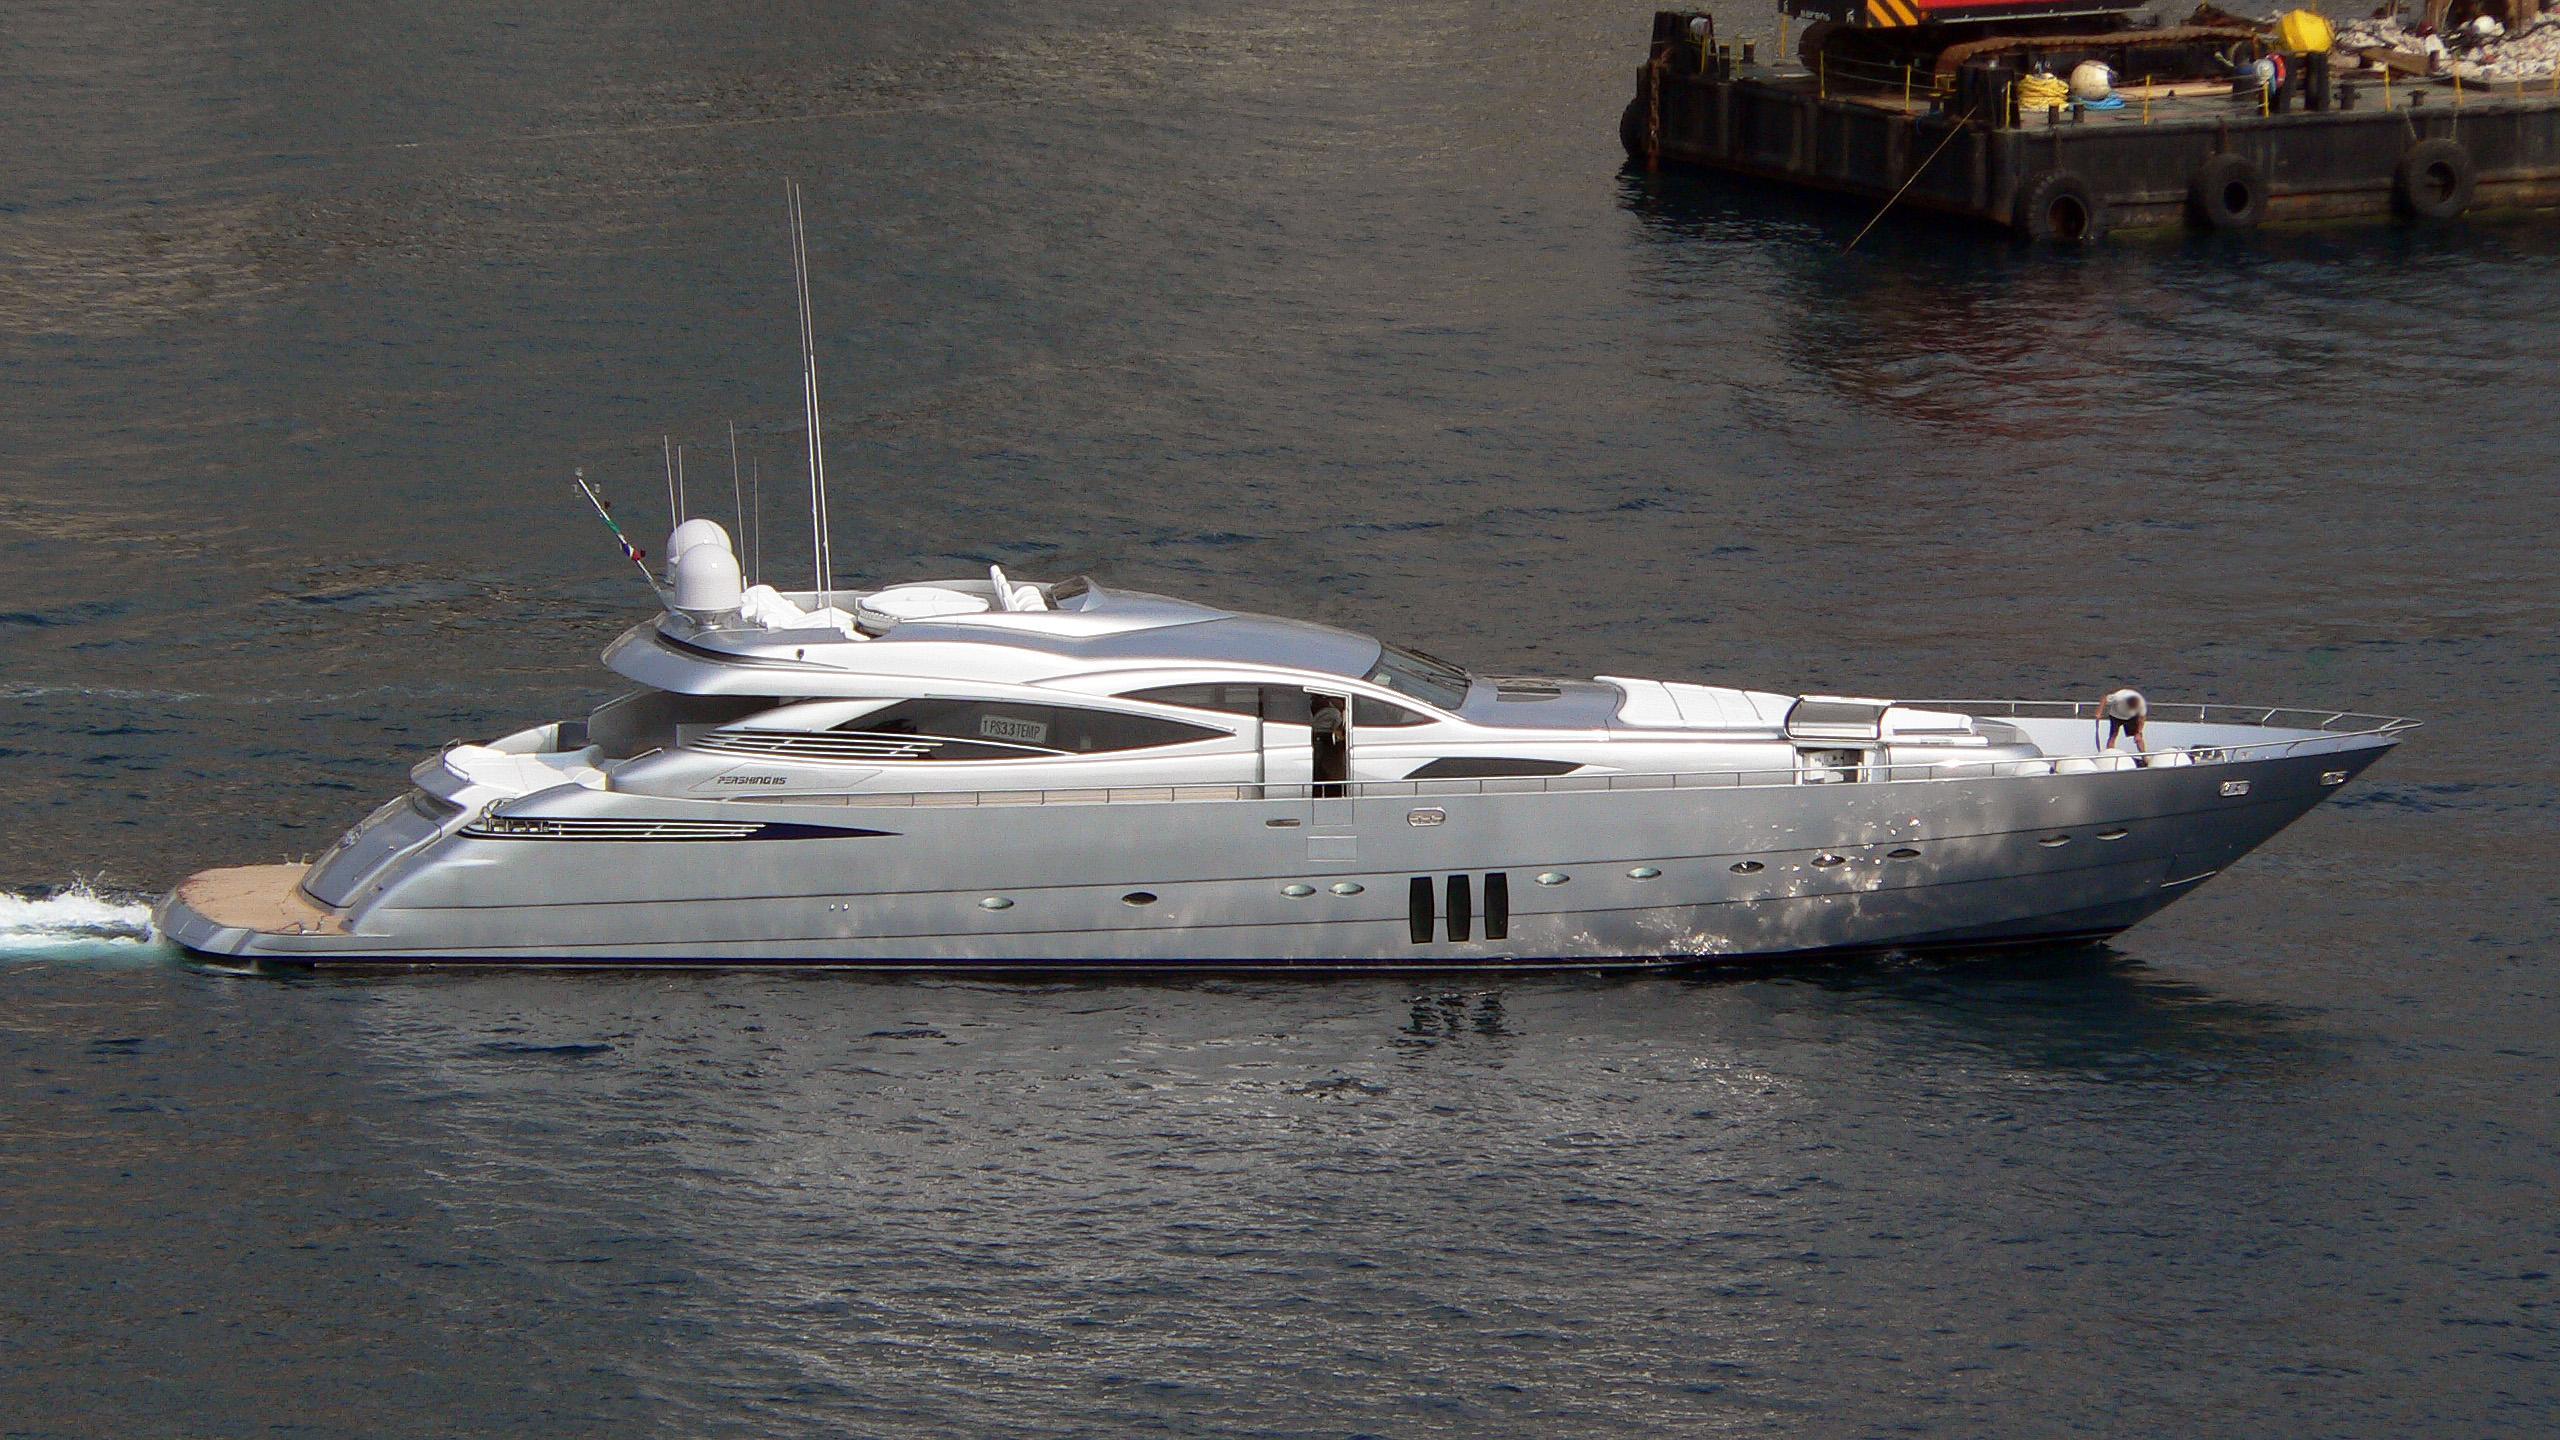 shooting-star-mistral-55-motor-yacht-pershing-115-2006-35m-cruising-half-profile